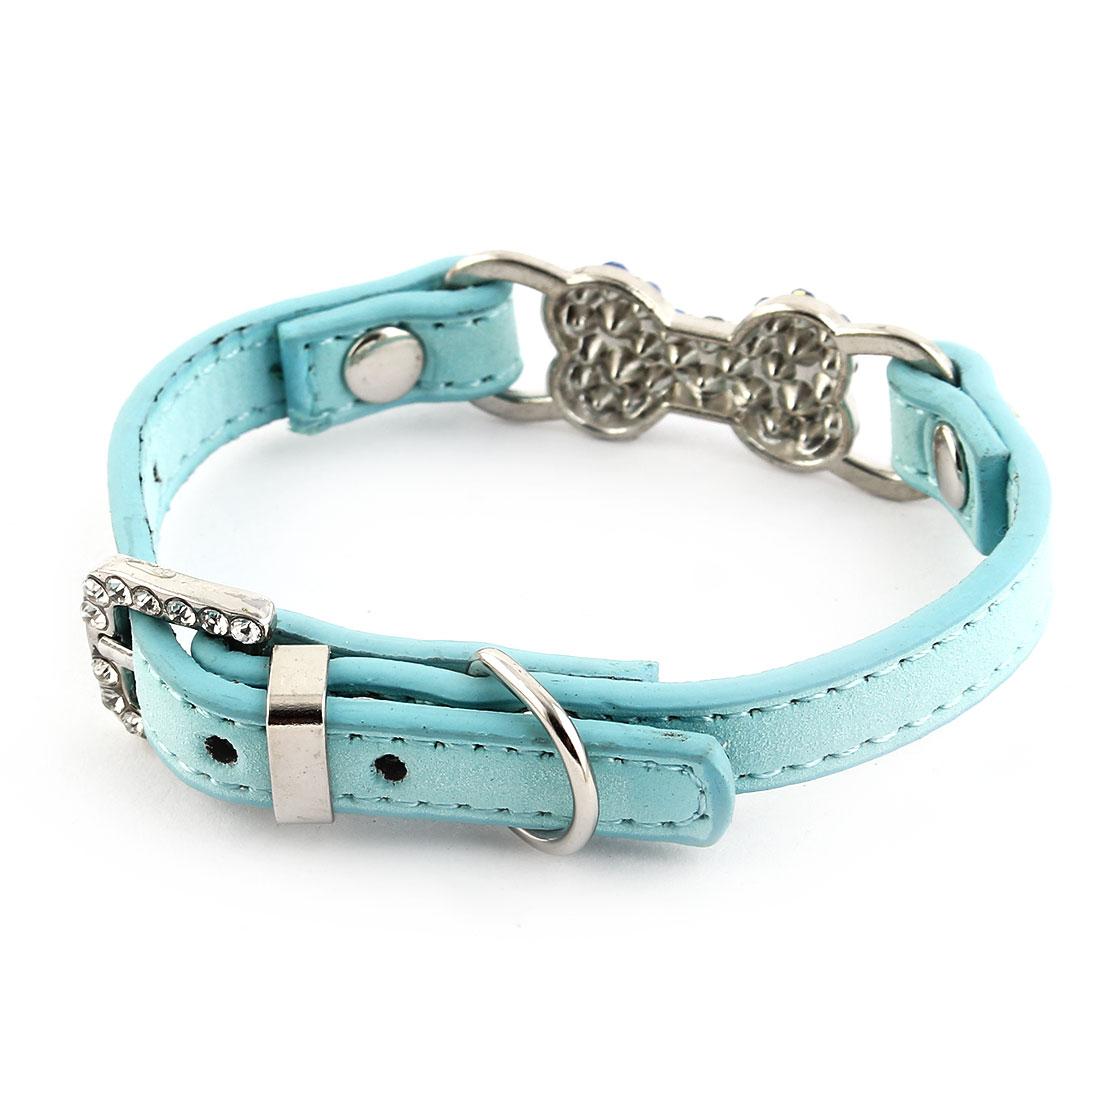 Bone Shape Decor Faux Rhinestones Inlaid Adjustable Pet Dog Cat Collar Blue XXS - image 4 of 5